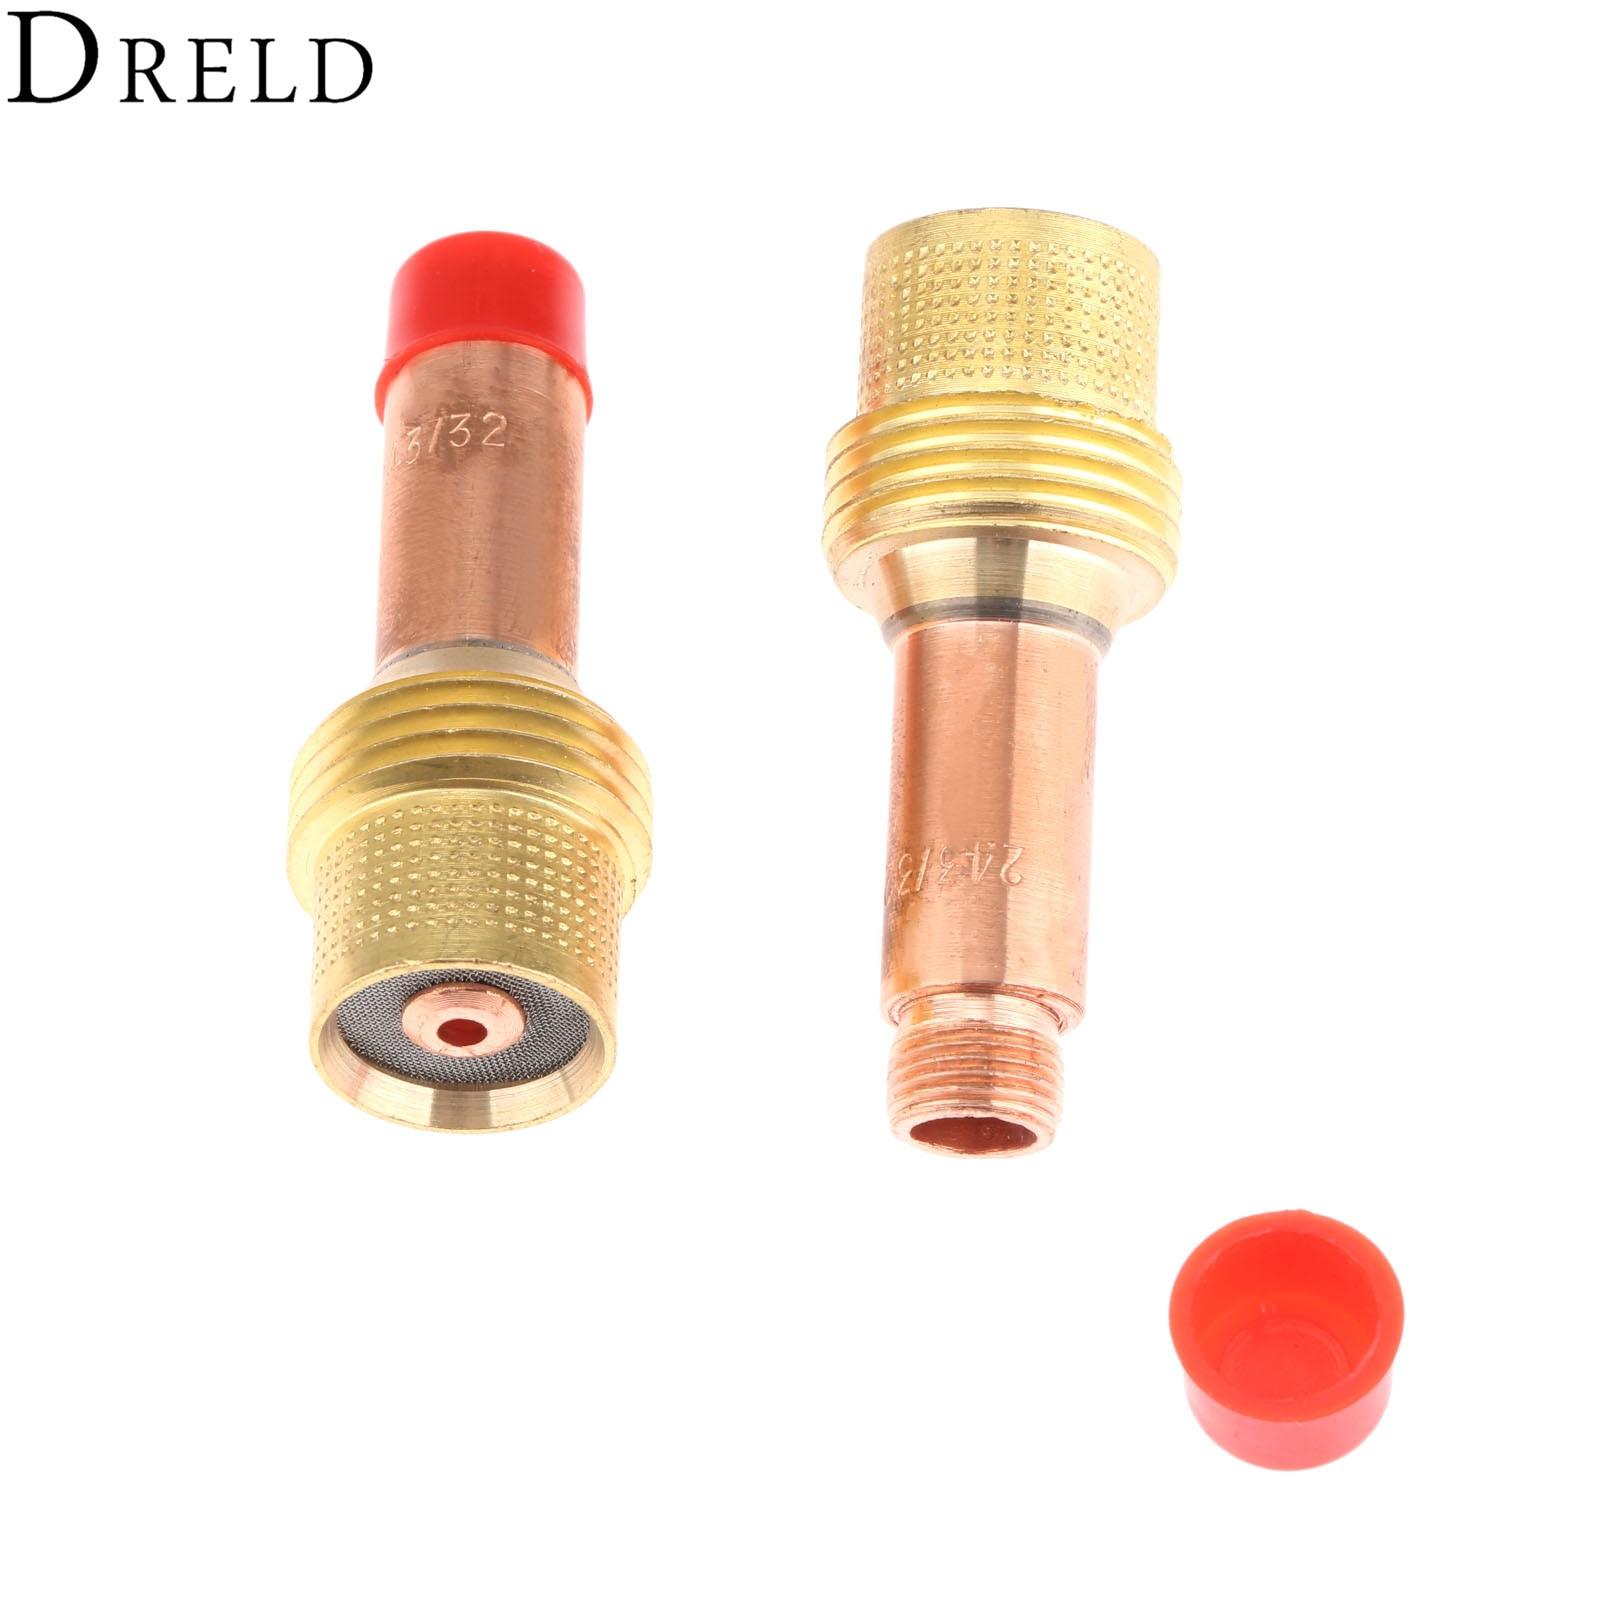 "Купить с кэшбэком DRELD 2pcs TIG Collets Body Gas Lens 45V26 2.4mm & 3/32"" Fit for TIG Welding Torch Consumables SR PTA DB WP 17 18 26 Series 2PK"